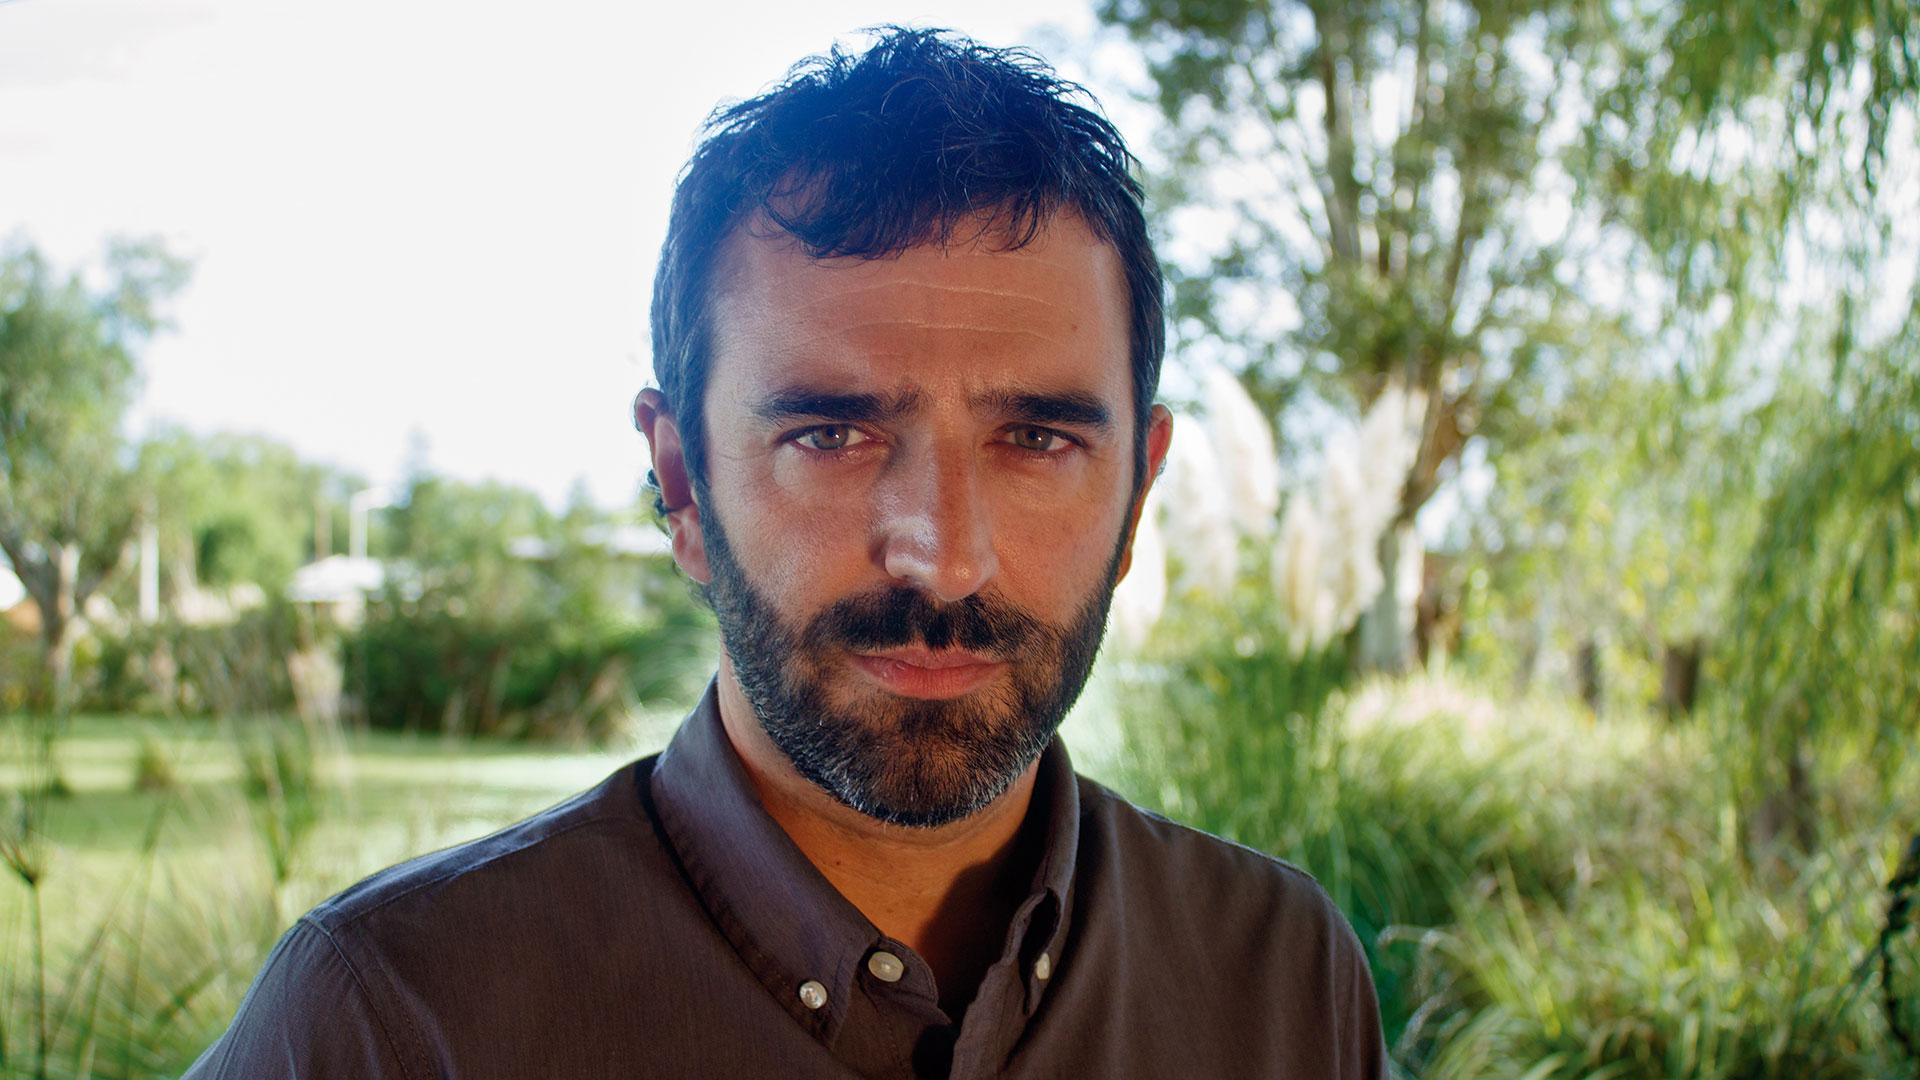 Hugo Salas